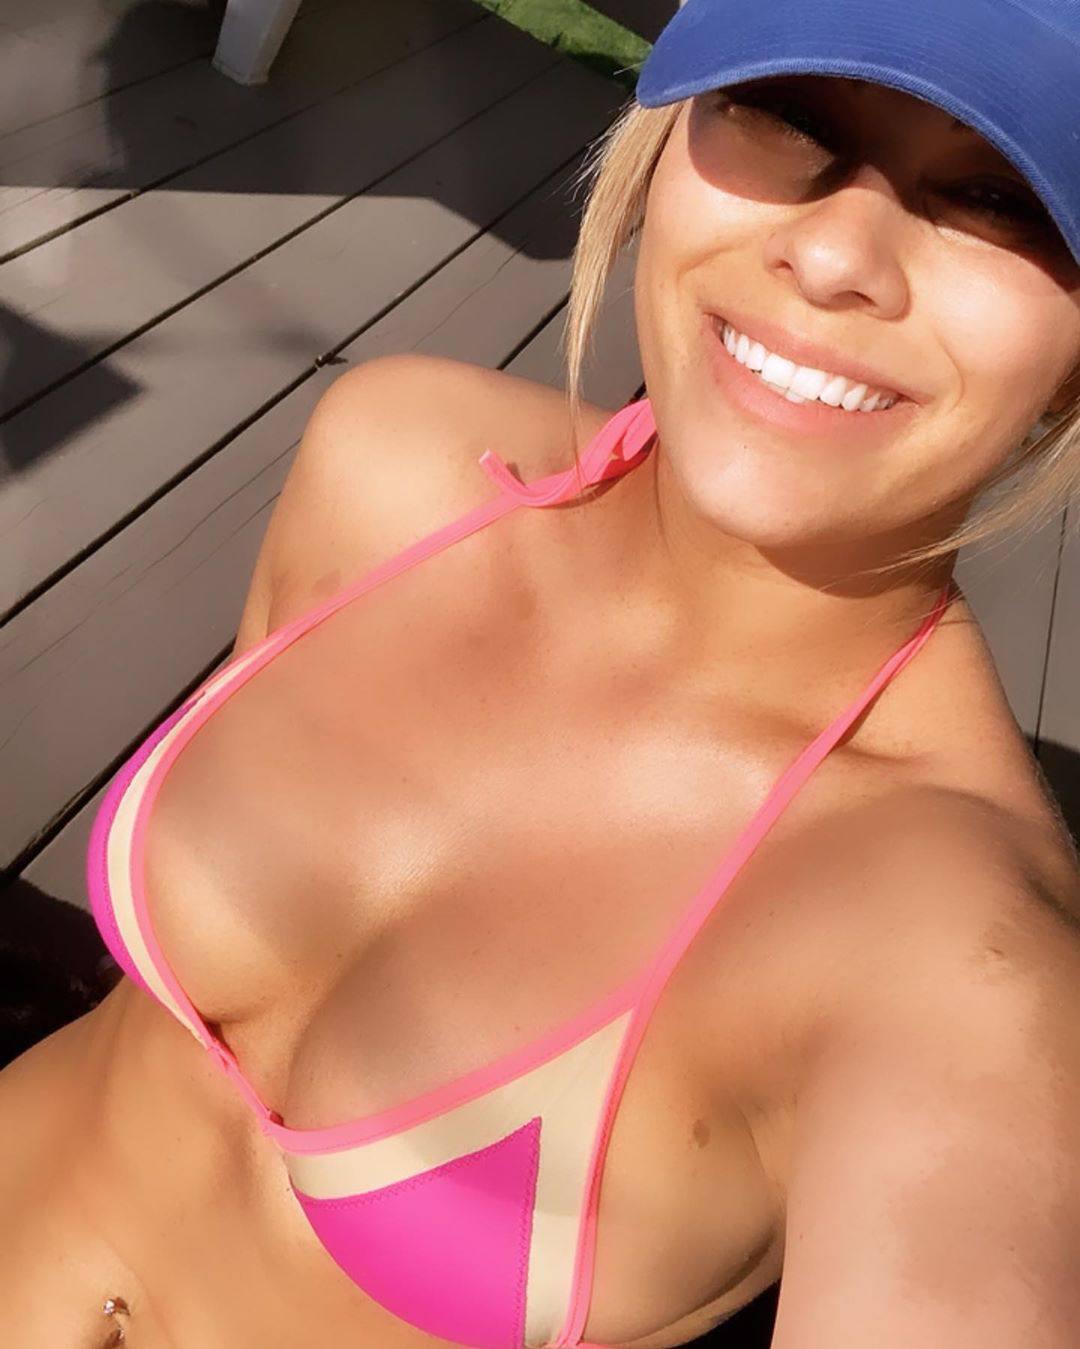 Paige Vanzant Sexy Boobs In A Bikini